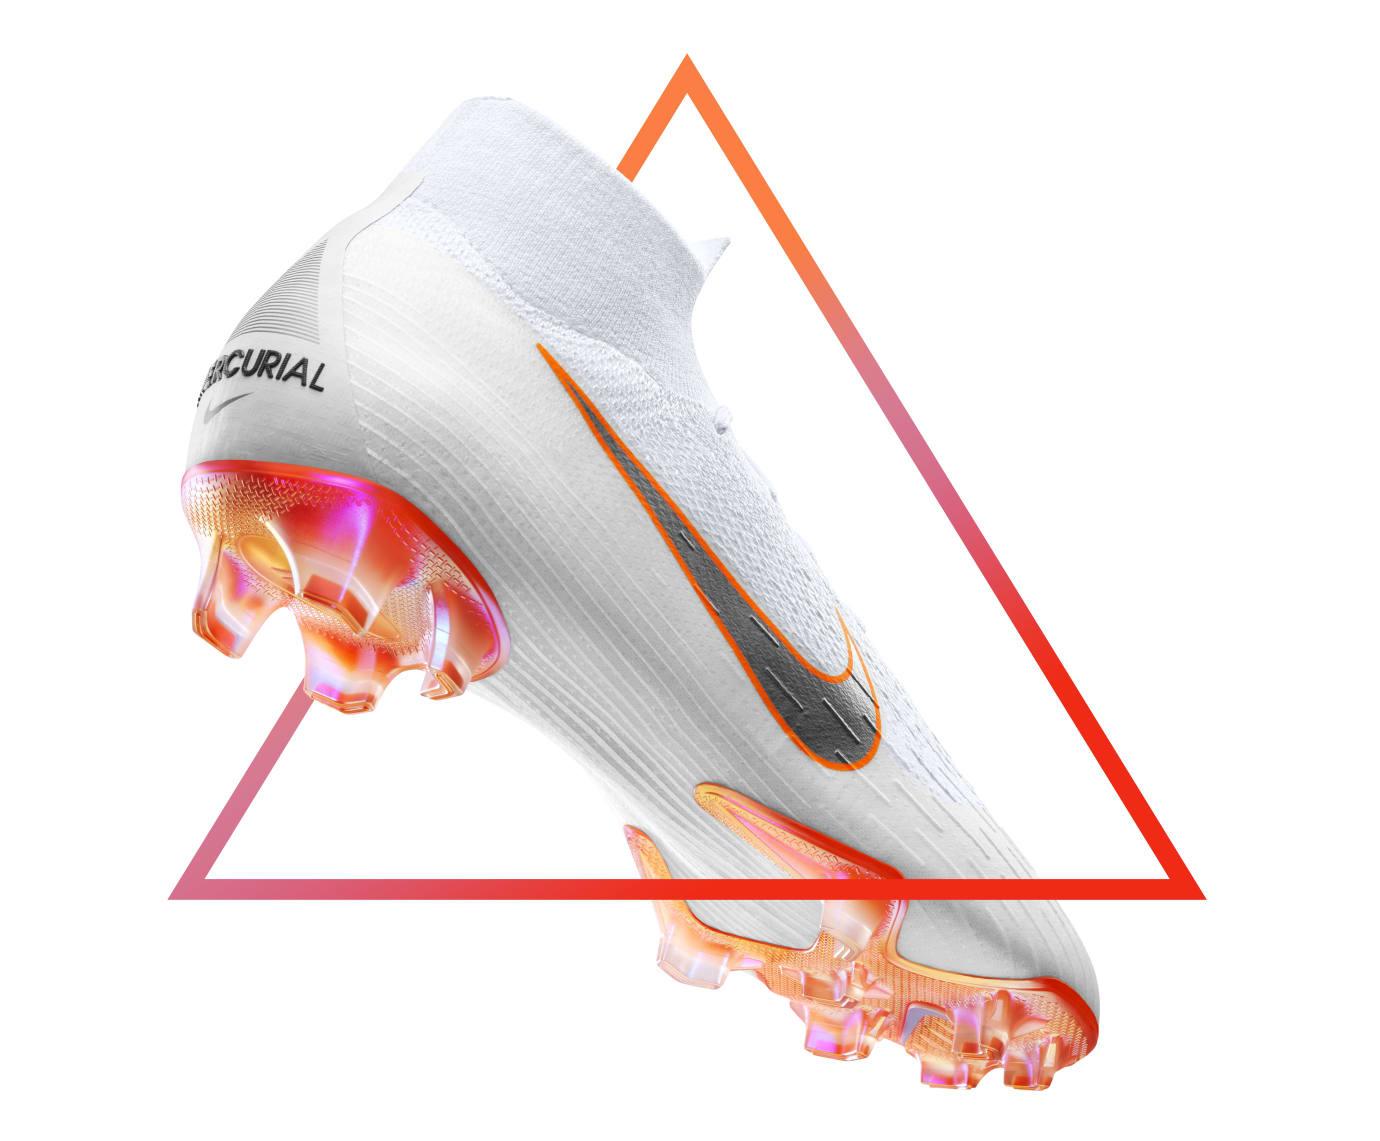 9b1a9b5da16 Nike Football  Just Do It  World Cup Pack Release Date